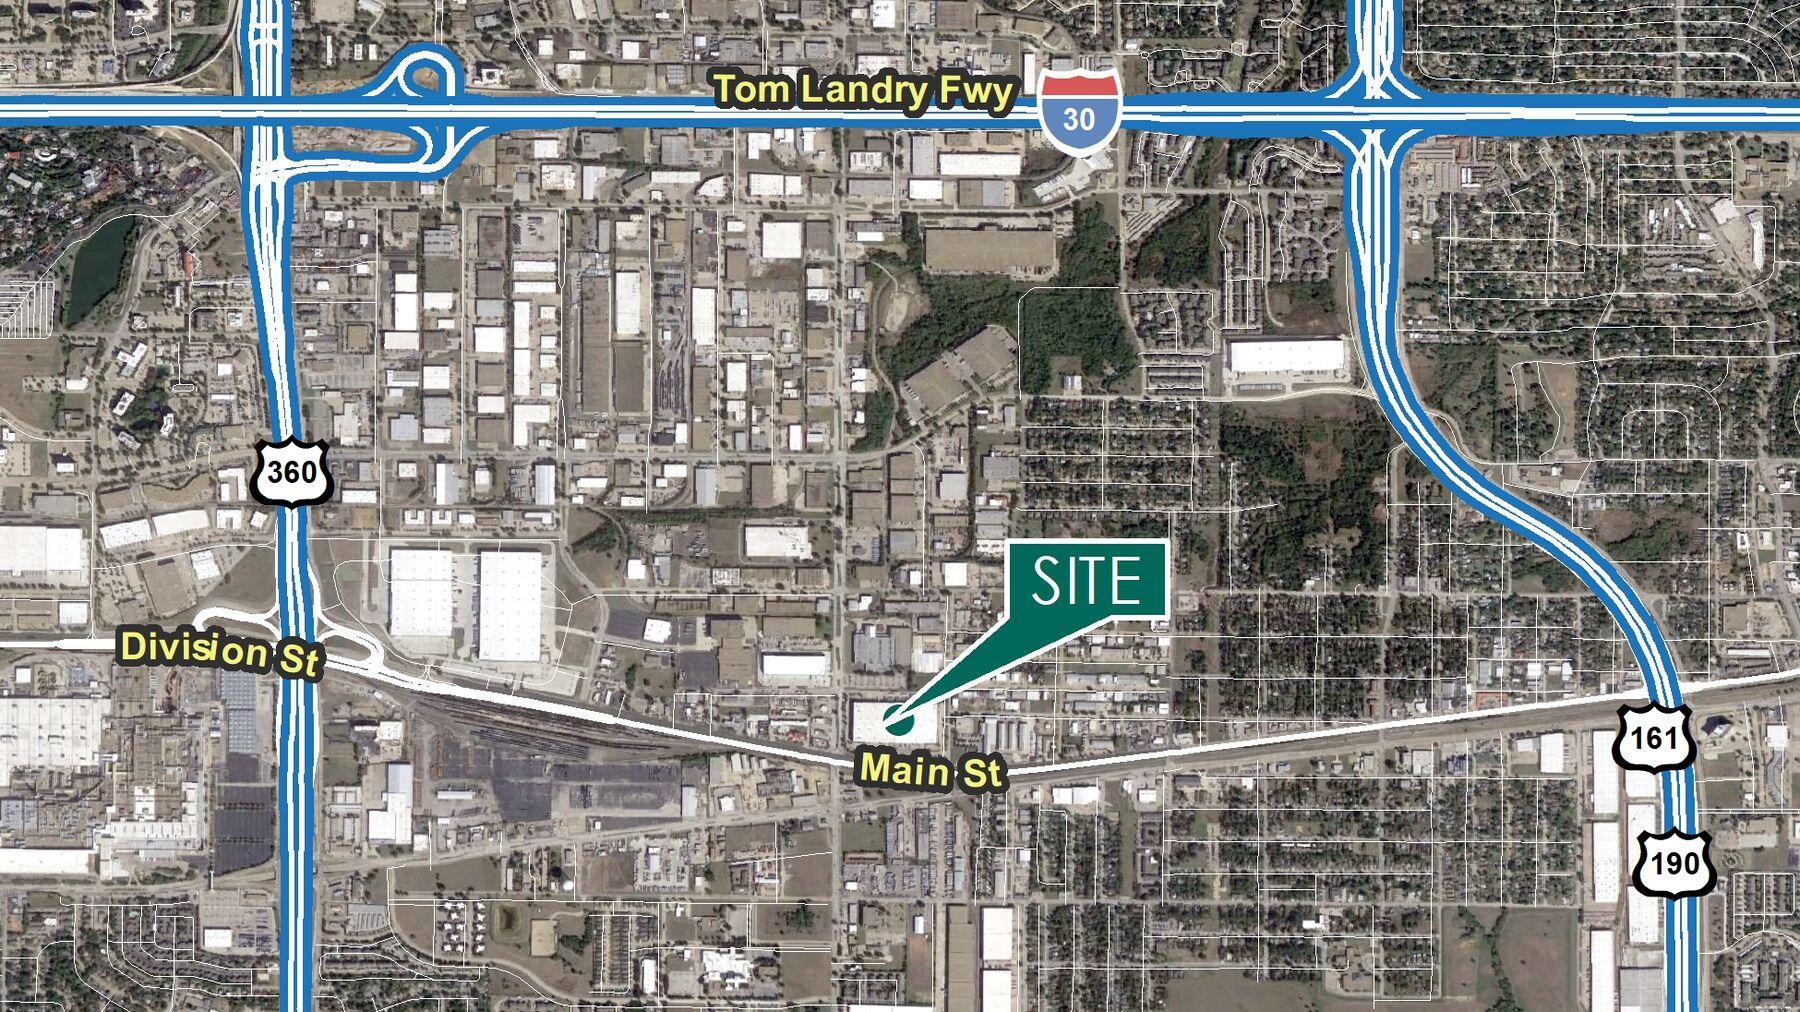 DPM-Prologis-Great-Southwest-84-DAL01784-2510-W-Main-Street_AerialMap.jpg